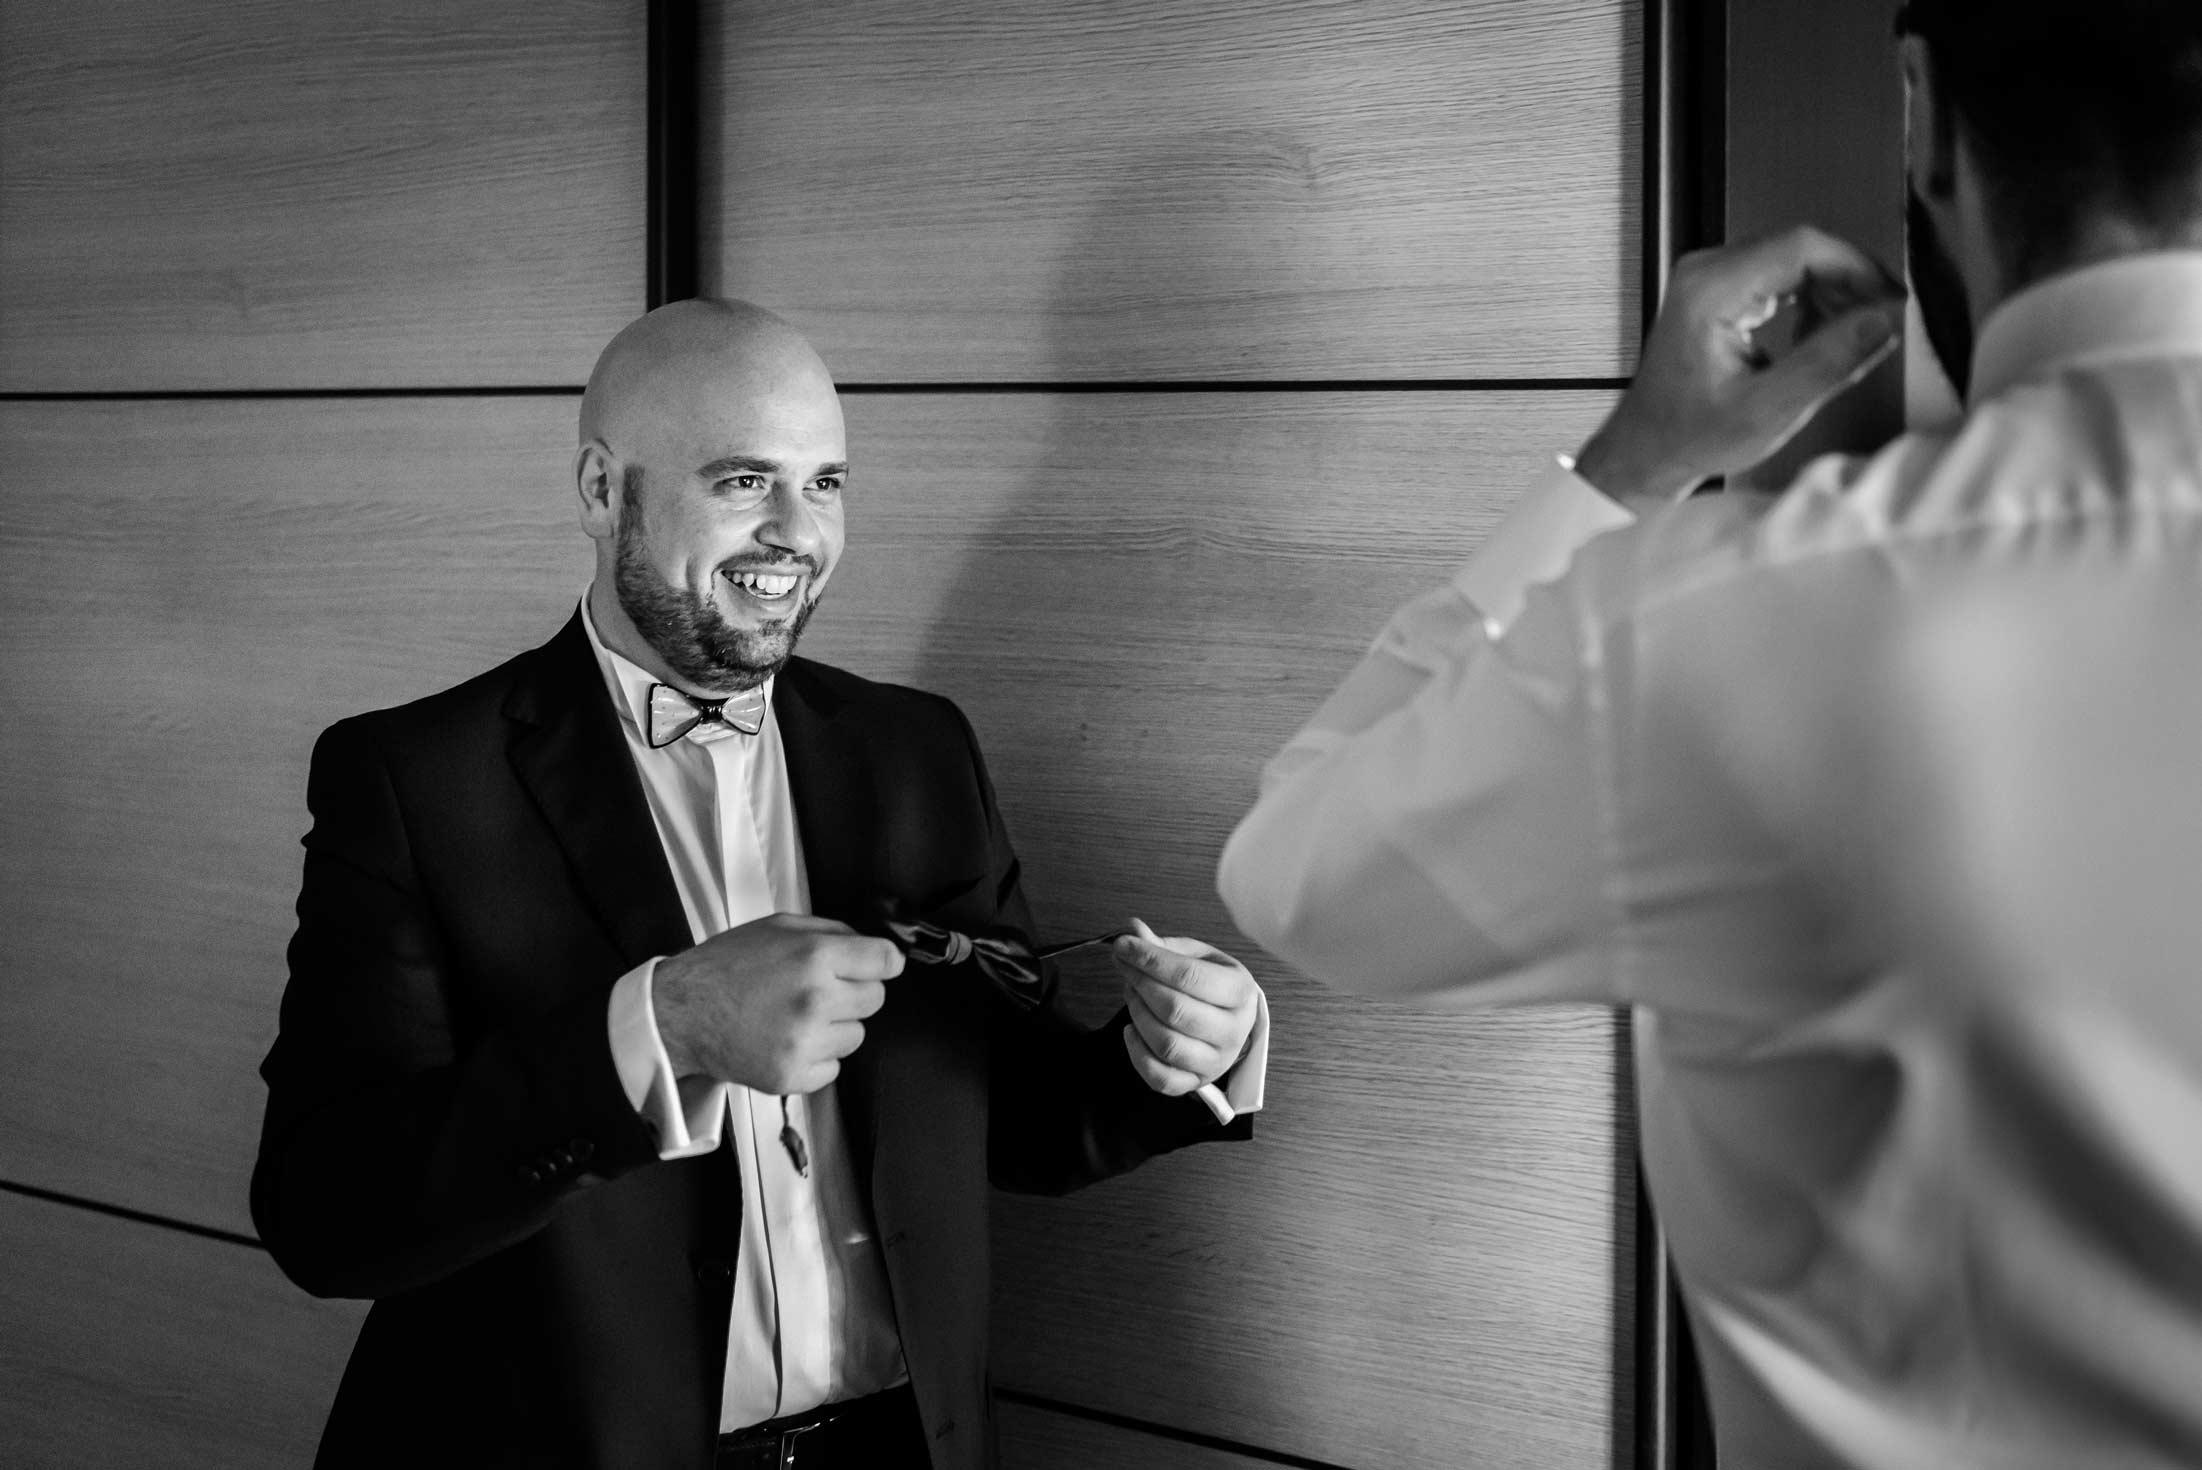 Wedding-Photographer-in-Italy-Reportage-Wedding-Photography-Groom